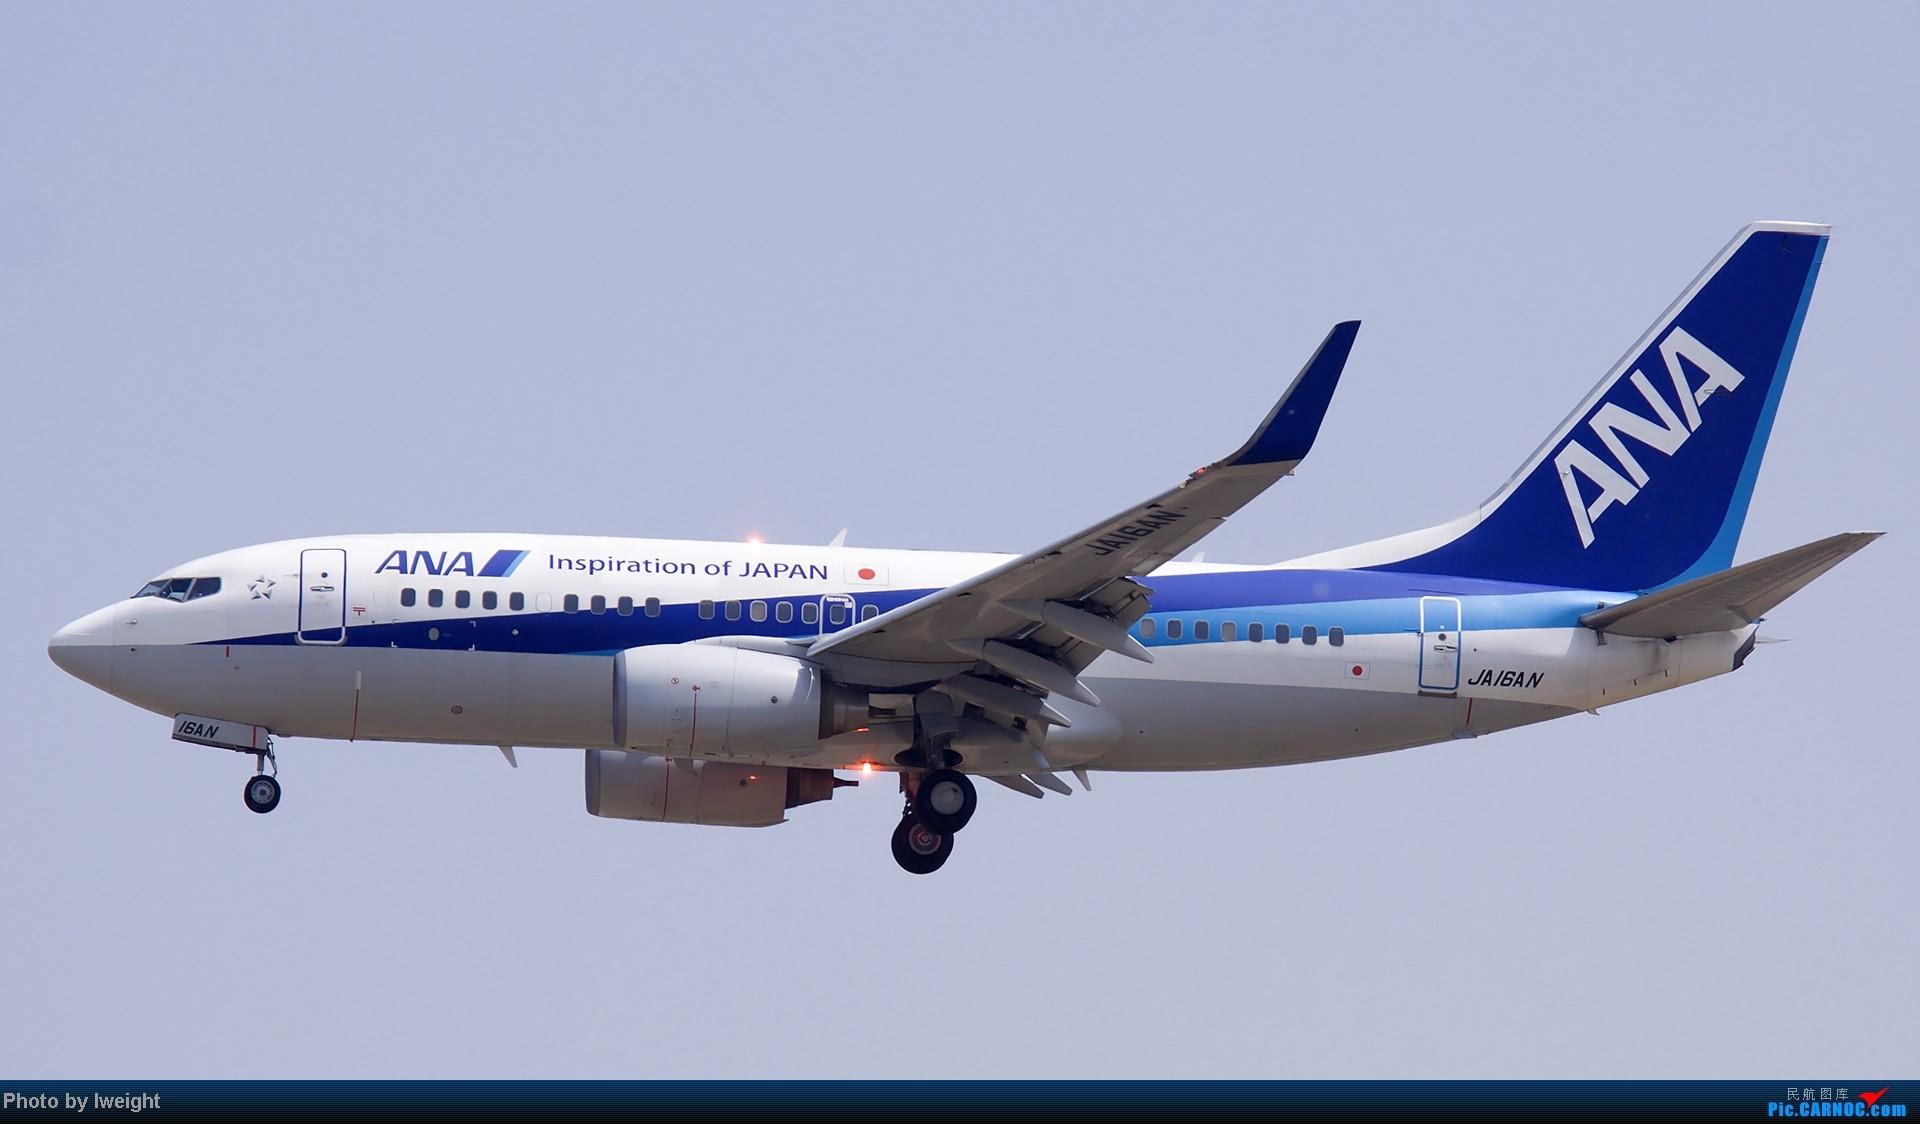 Re:[原创]错过了卡航的巴塞罗那号,只有这些大路货了,泪奔啊 BOEING 737-700 JA16AN 中国北京首都机场